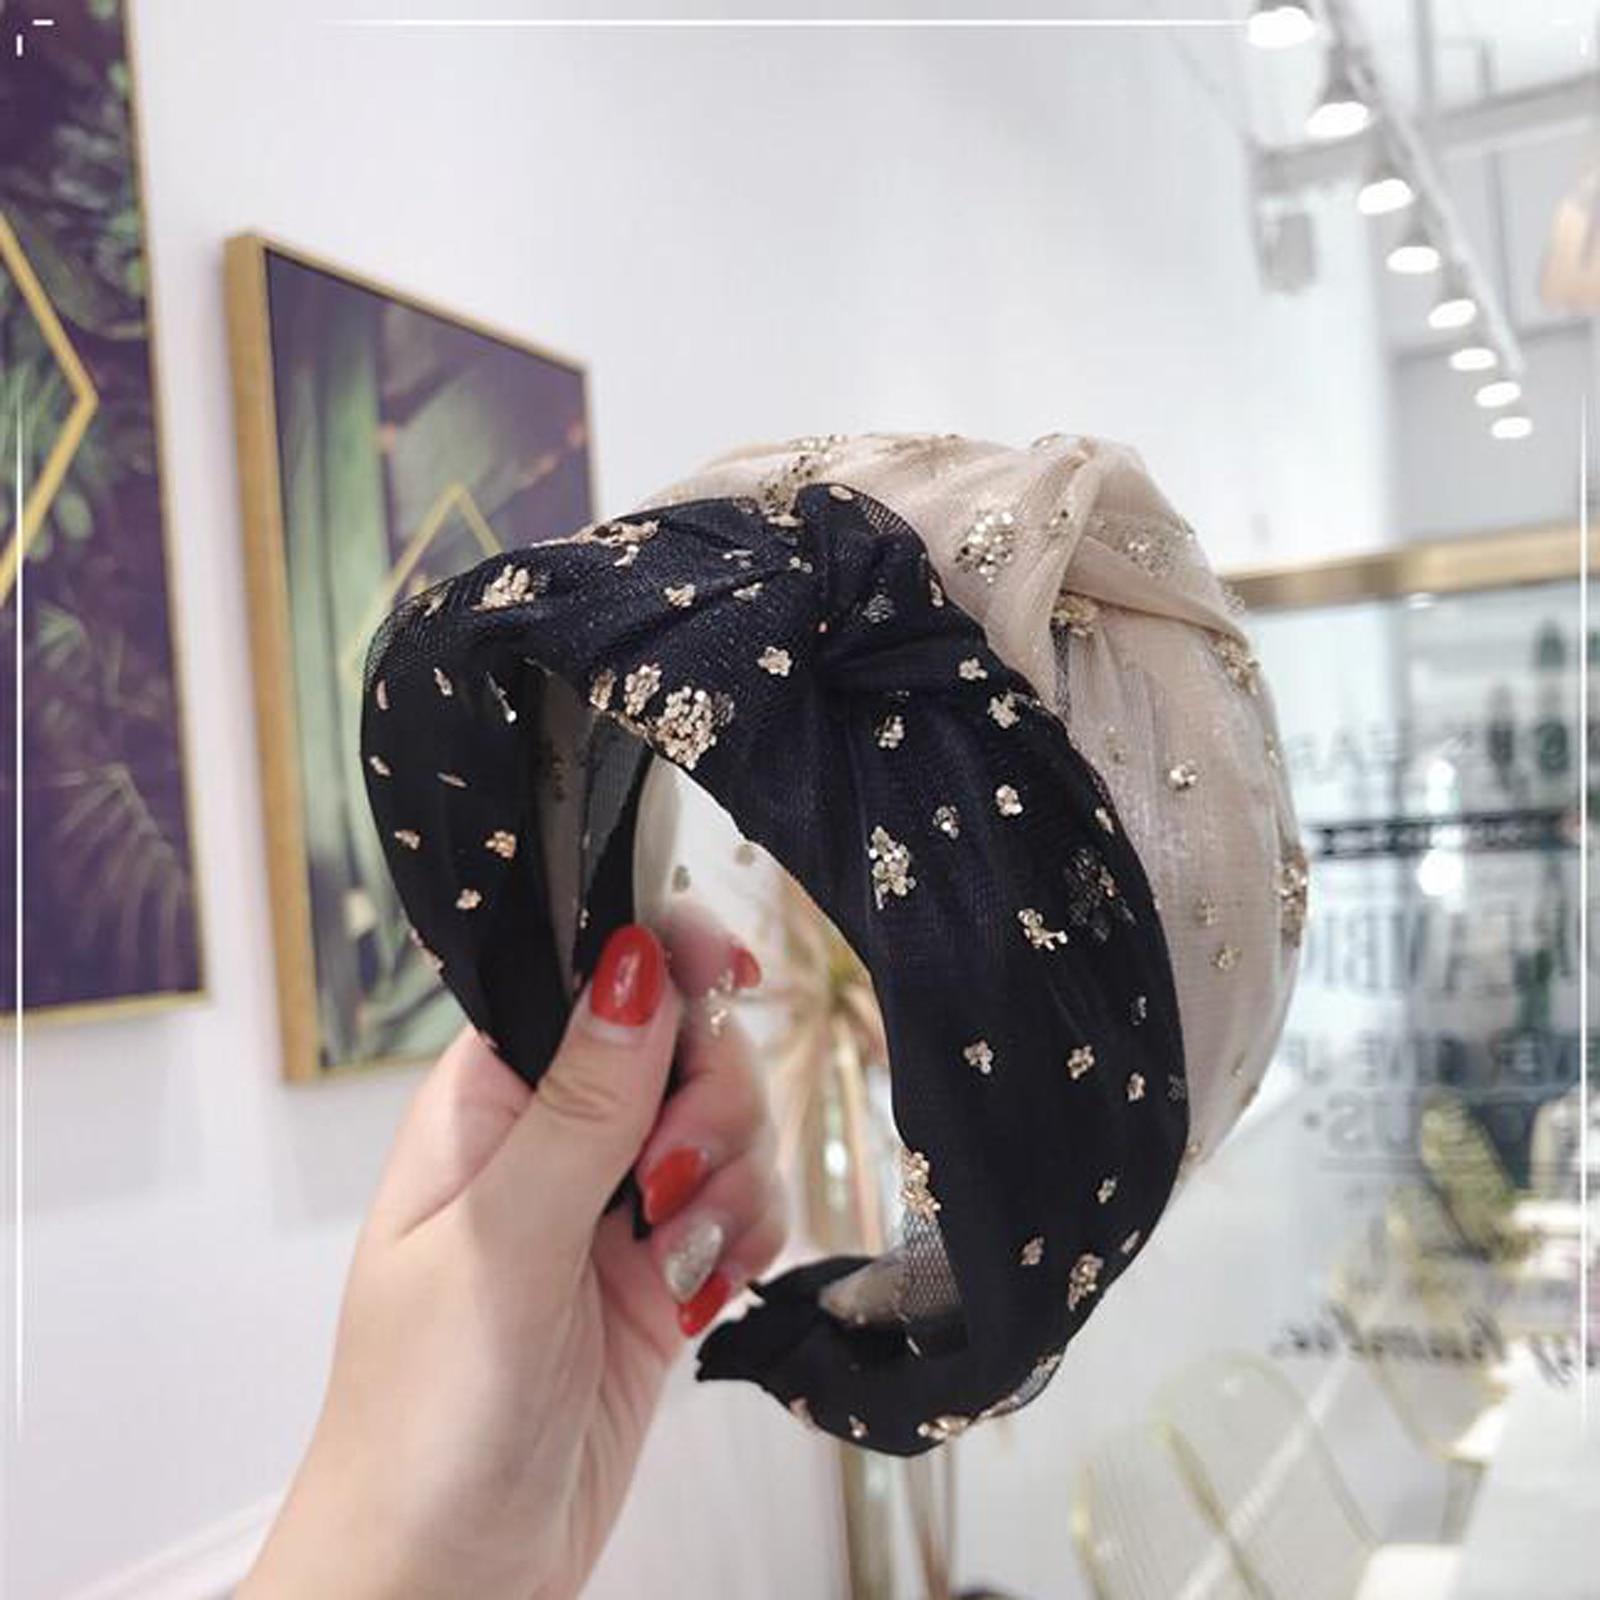 Fashion Girls Headband Shiny Snowflake Rhinestone Hairband Wide Side Middle Knot Turban Bandanas Hair Accessories